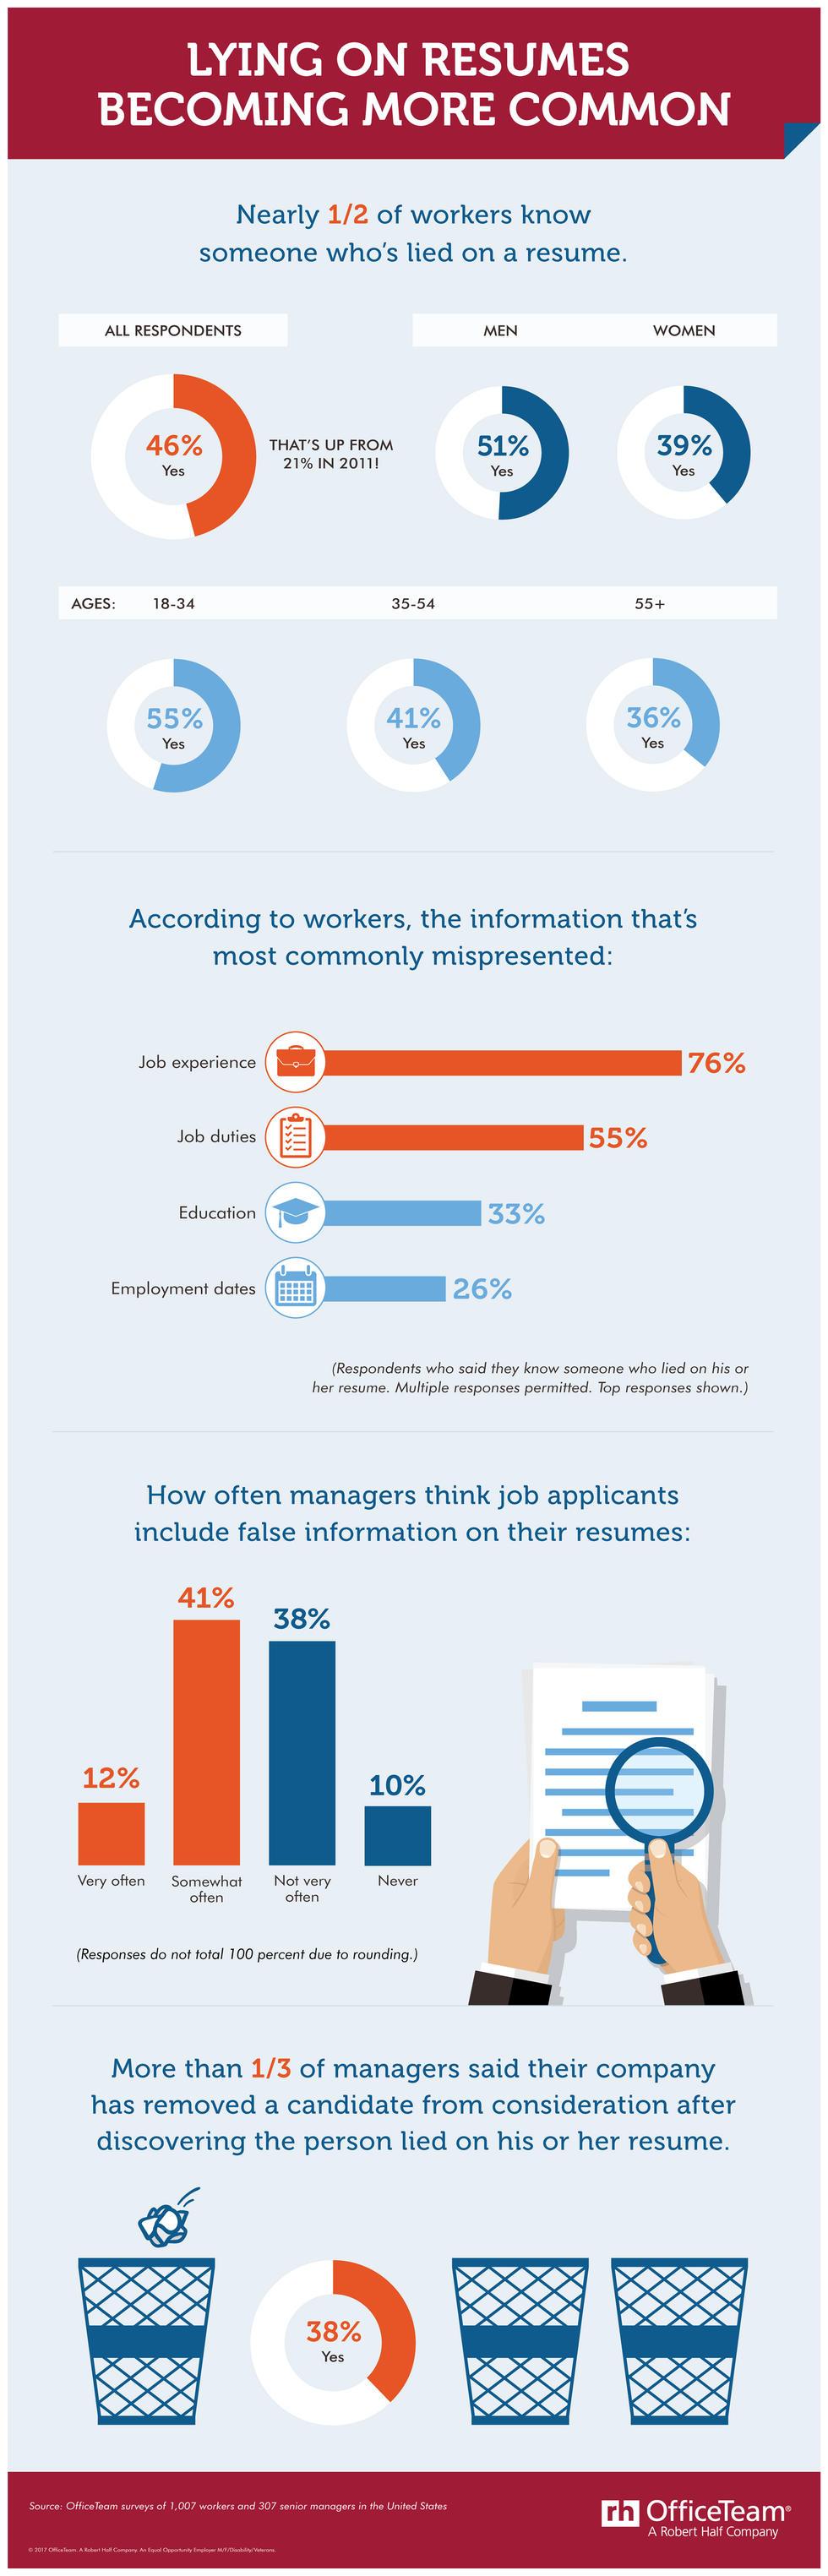 Lying on résumés may be on the rise survey says